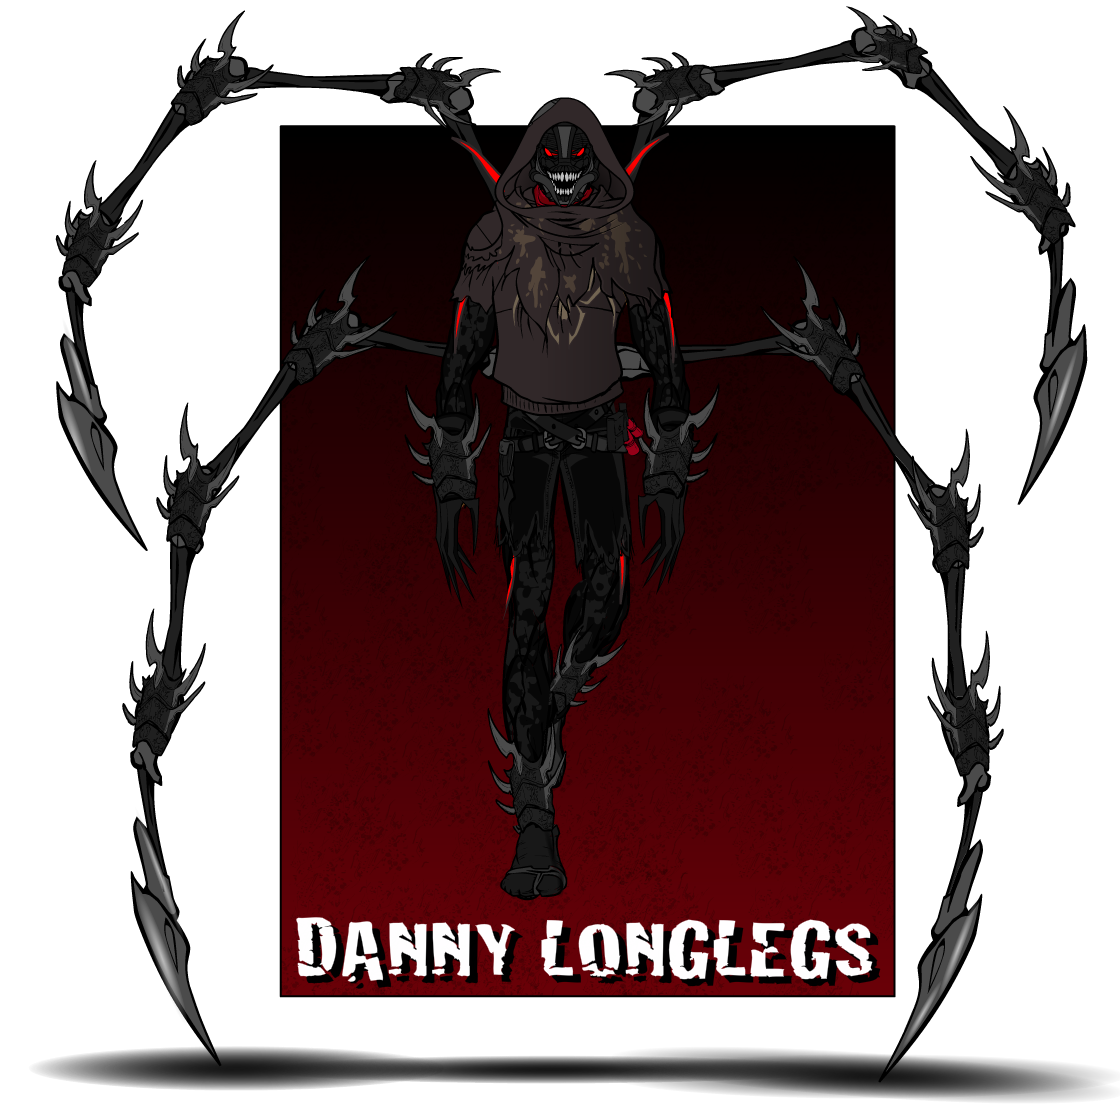 Danny Longlegs